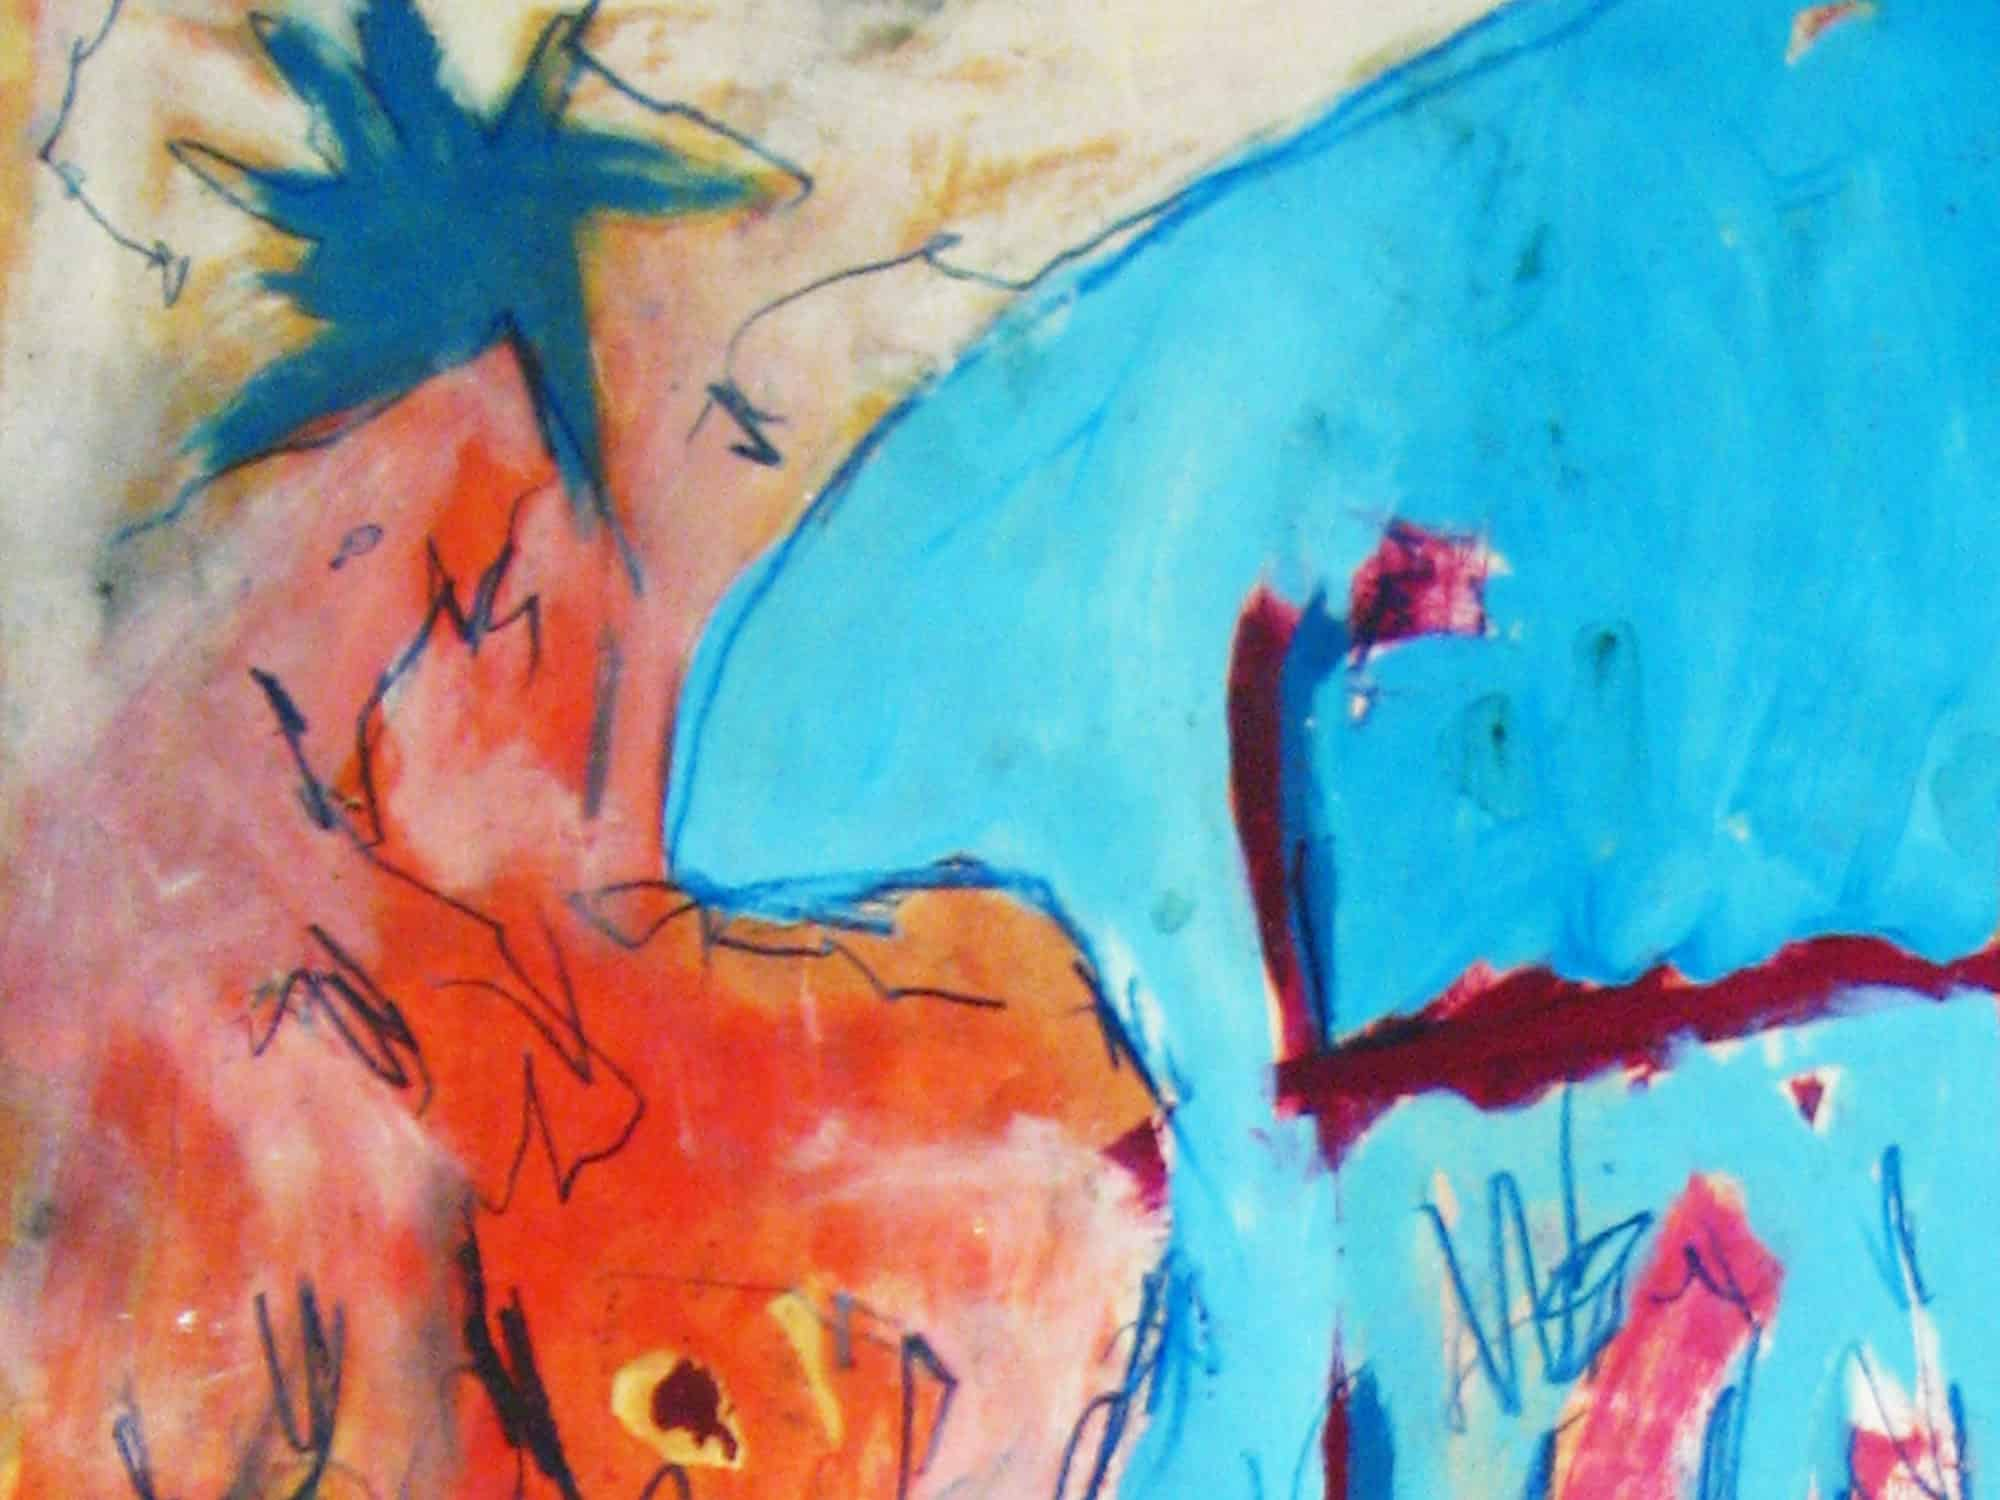 Modernes Kunstbild Acryl auf Leinwand mit Blau